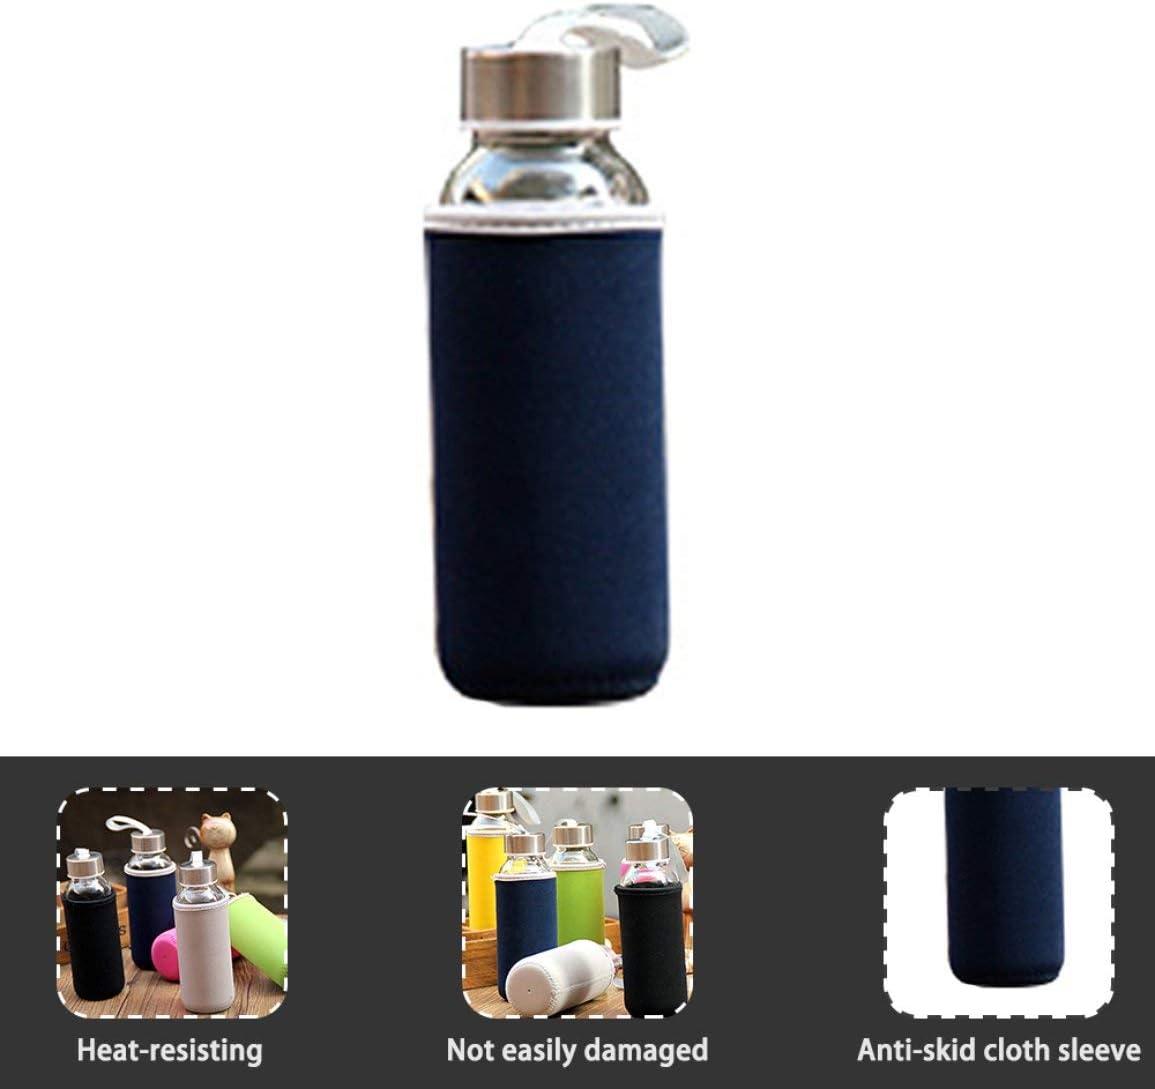 Garciasia Botella de Vidrio de 300 ml Botella de Agua de Vidrio de borosilicato con Bolsa de Tela Bolsa de Bebida de Viaje portátil (Color: Azul Oscuro)